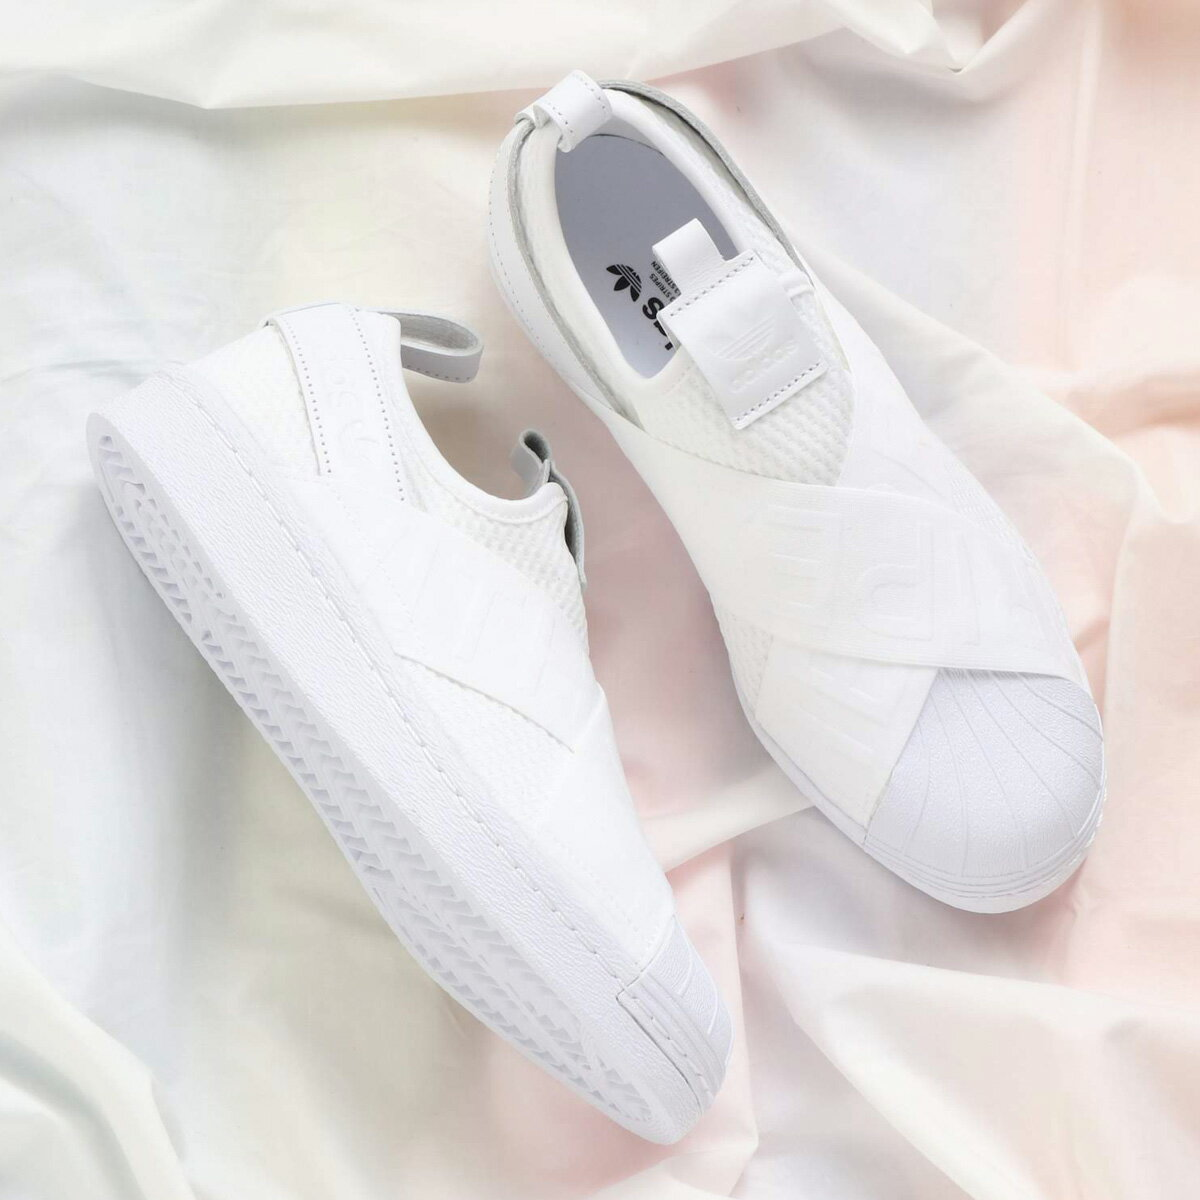 adidas Originals SUPERSTAR SLIPON W (アディダス オリジナルス スーパースタースリッポン W) Running White/Running White/Core Black【レディース スニーカー】18SS-I